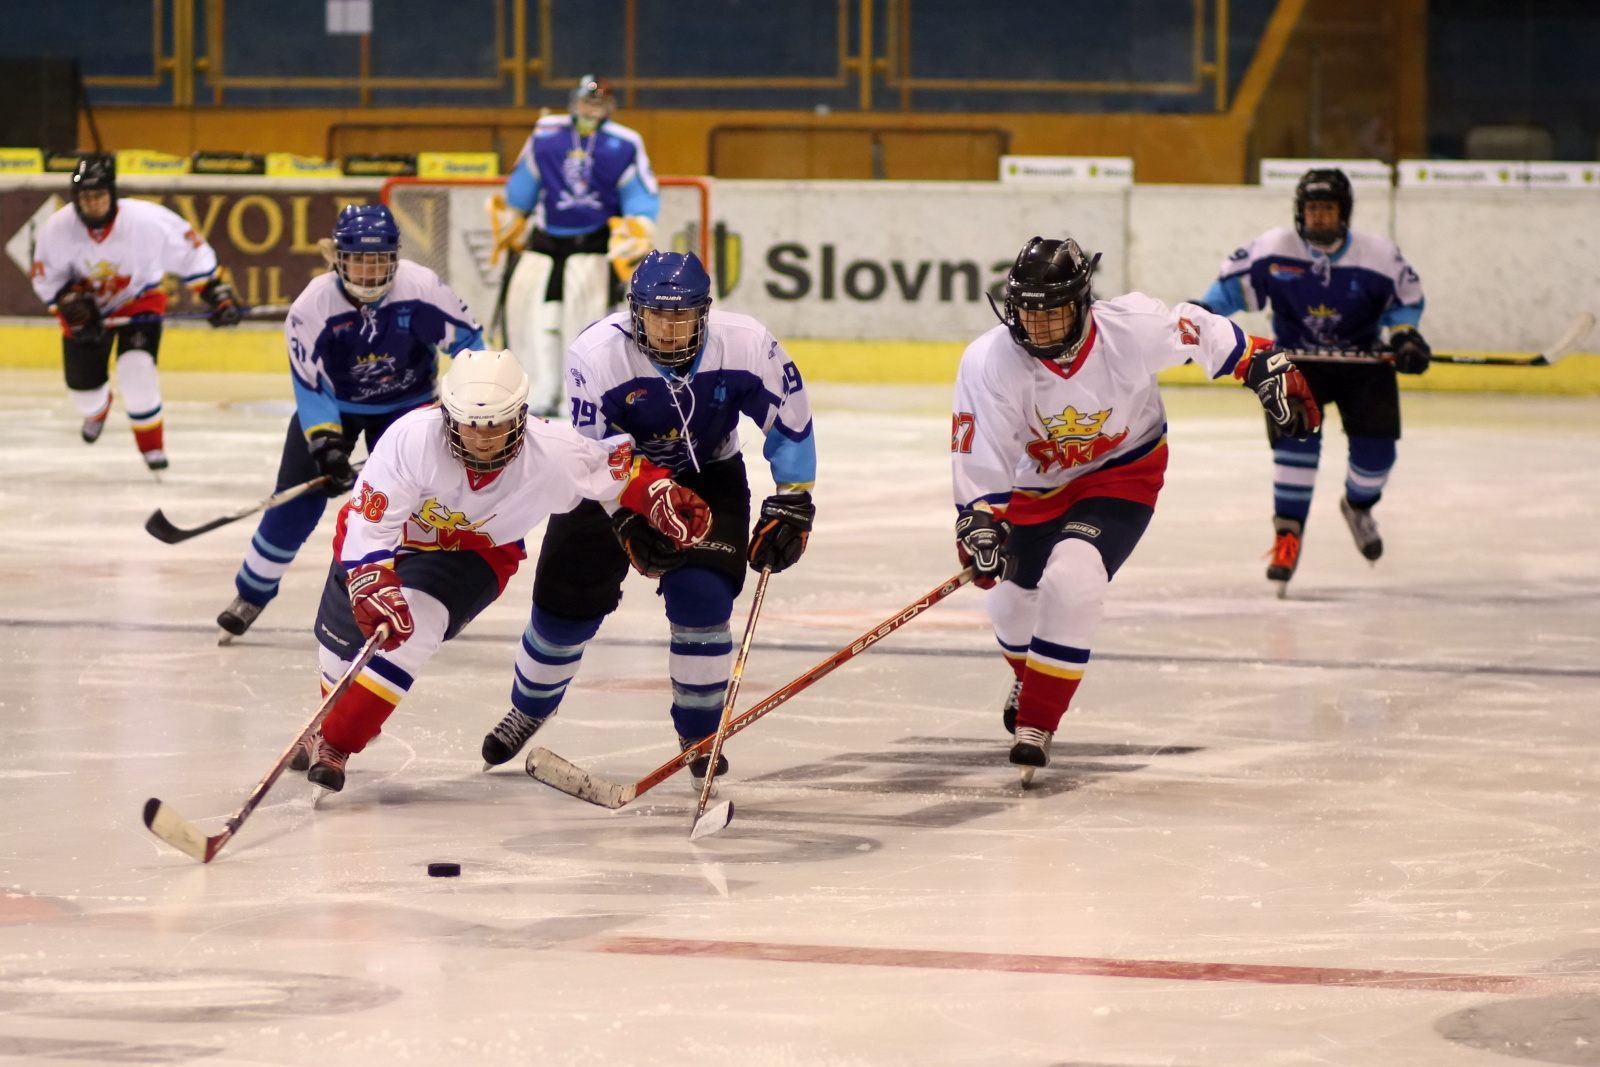 zhkm-zvolen-martin-hokej-2011-7